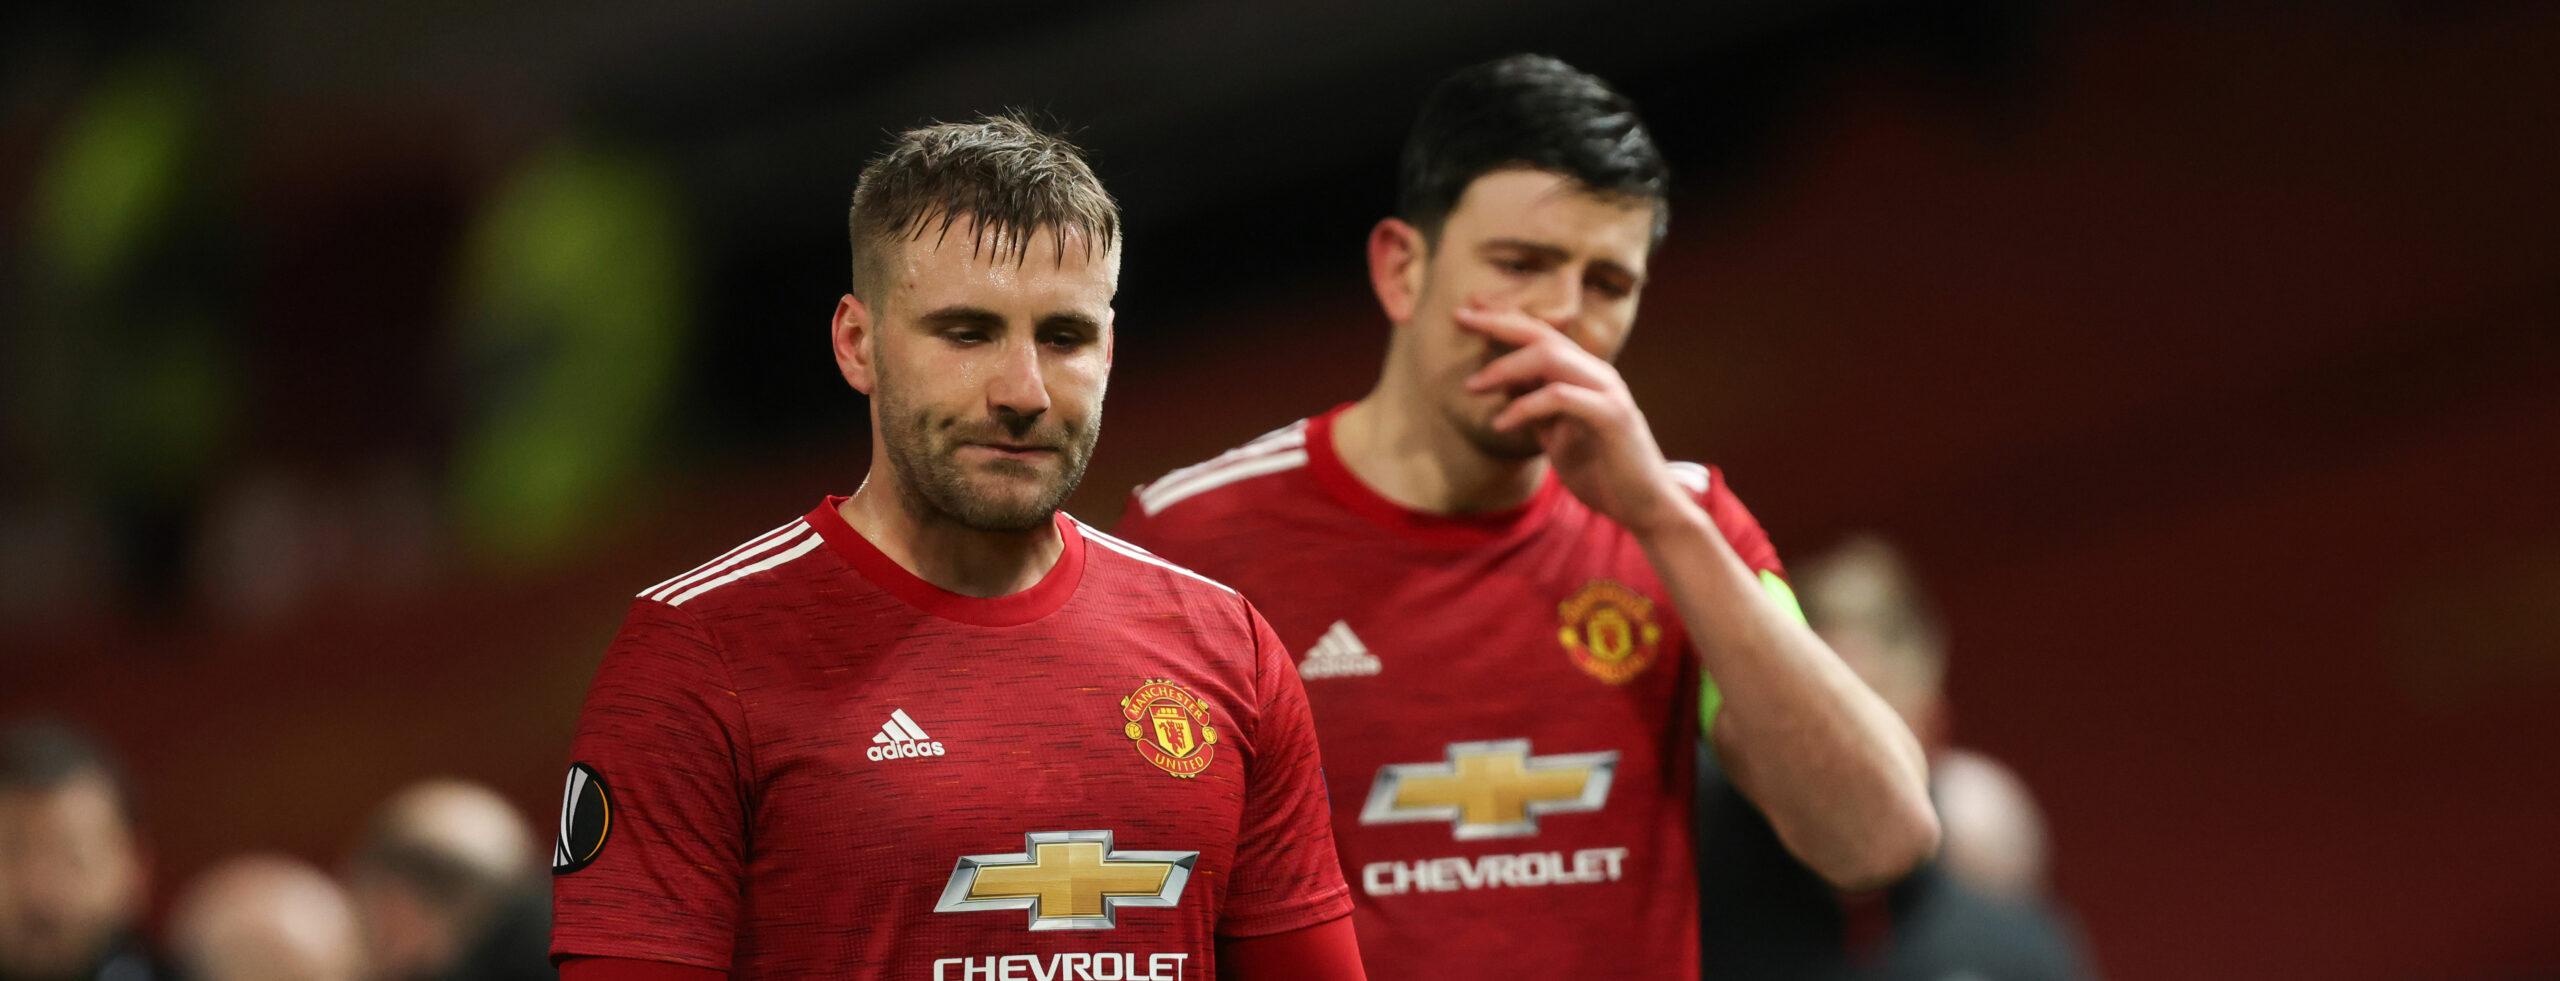 Man Utd vs Brighton: Seagulls to cause United problems